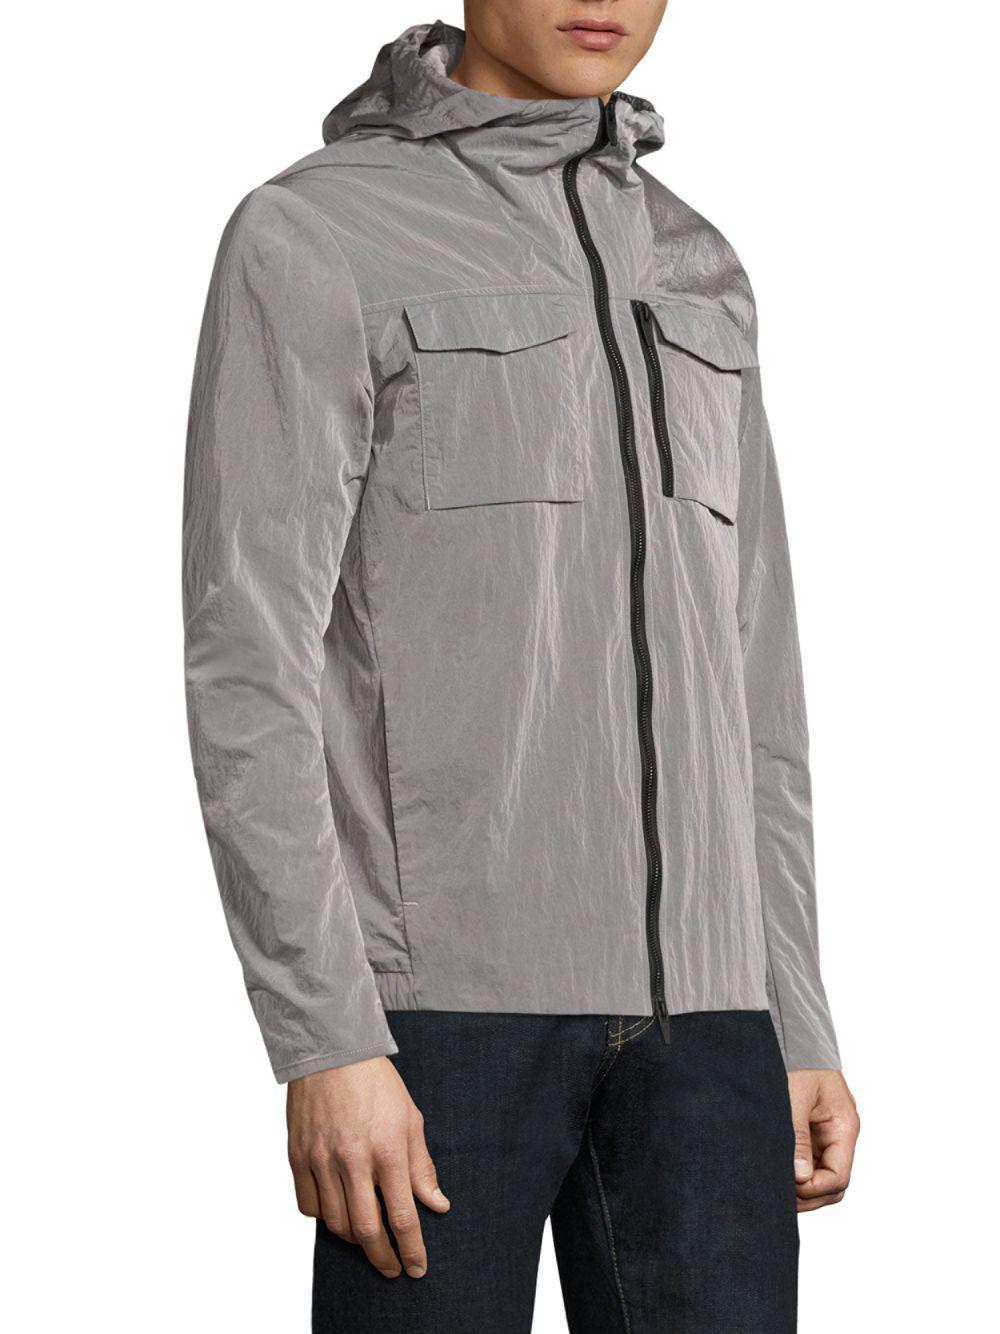 J.Lindeberg Synthetic Jonah Crinkle Hooded Jacket in Light Grey (Grey) for Men